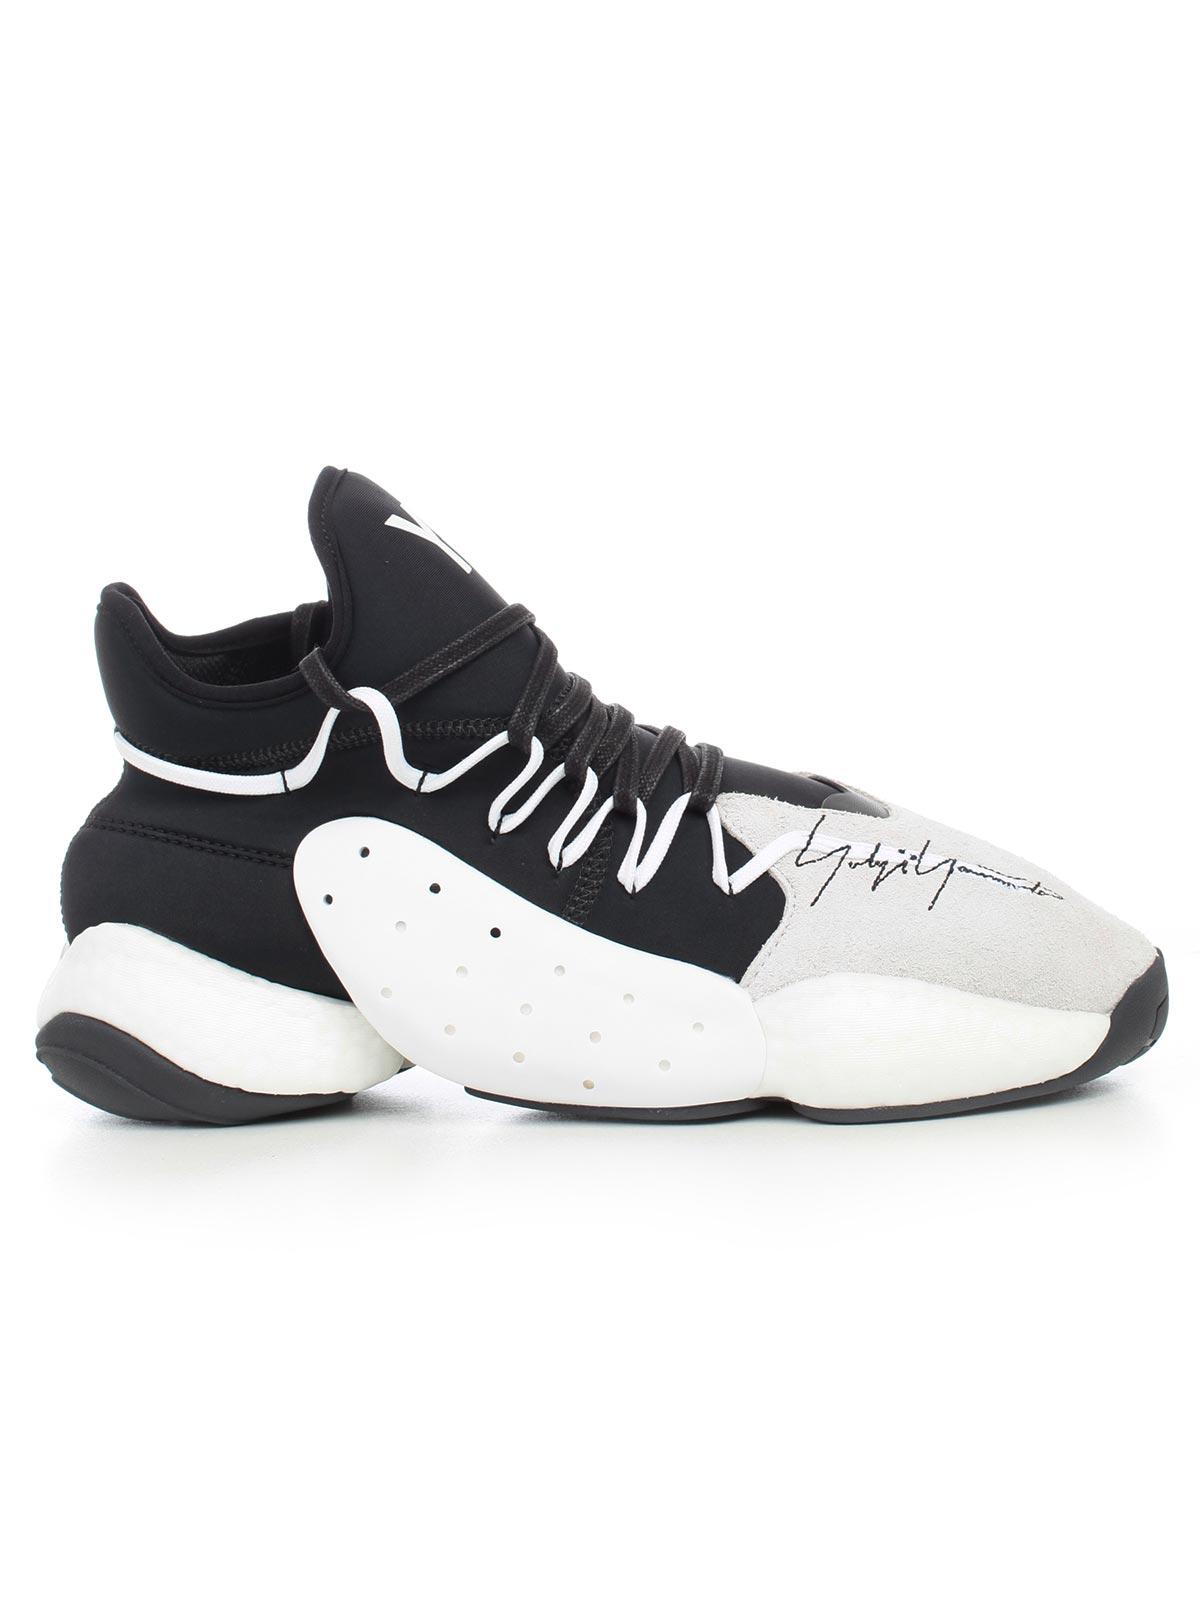 Picture of Y-3 Yohji Yamamoto Adidas  Shoes